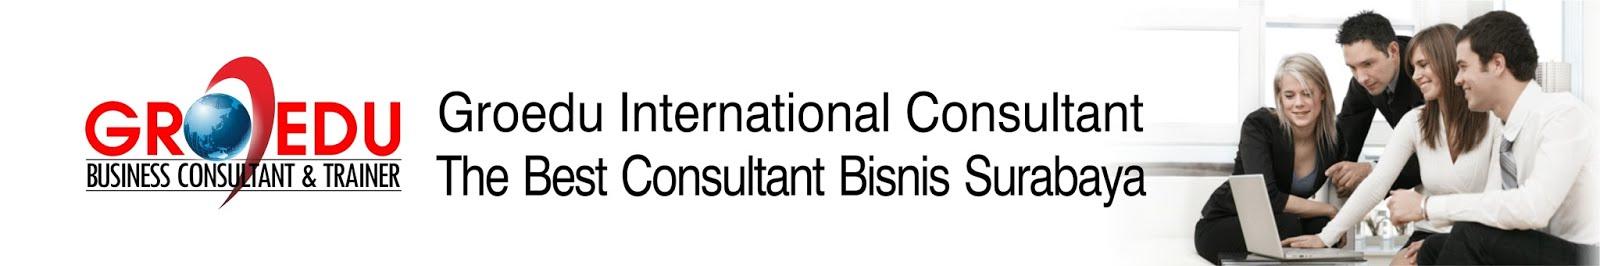 Groedu International consultant